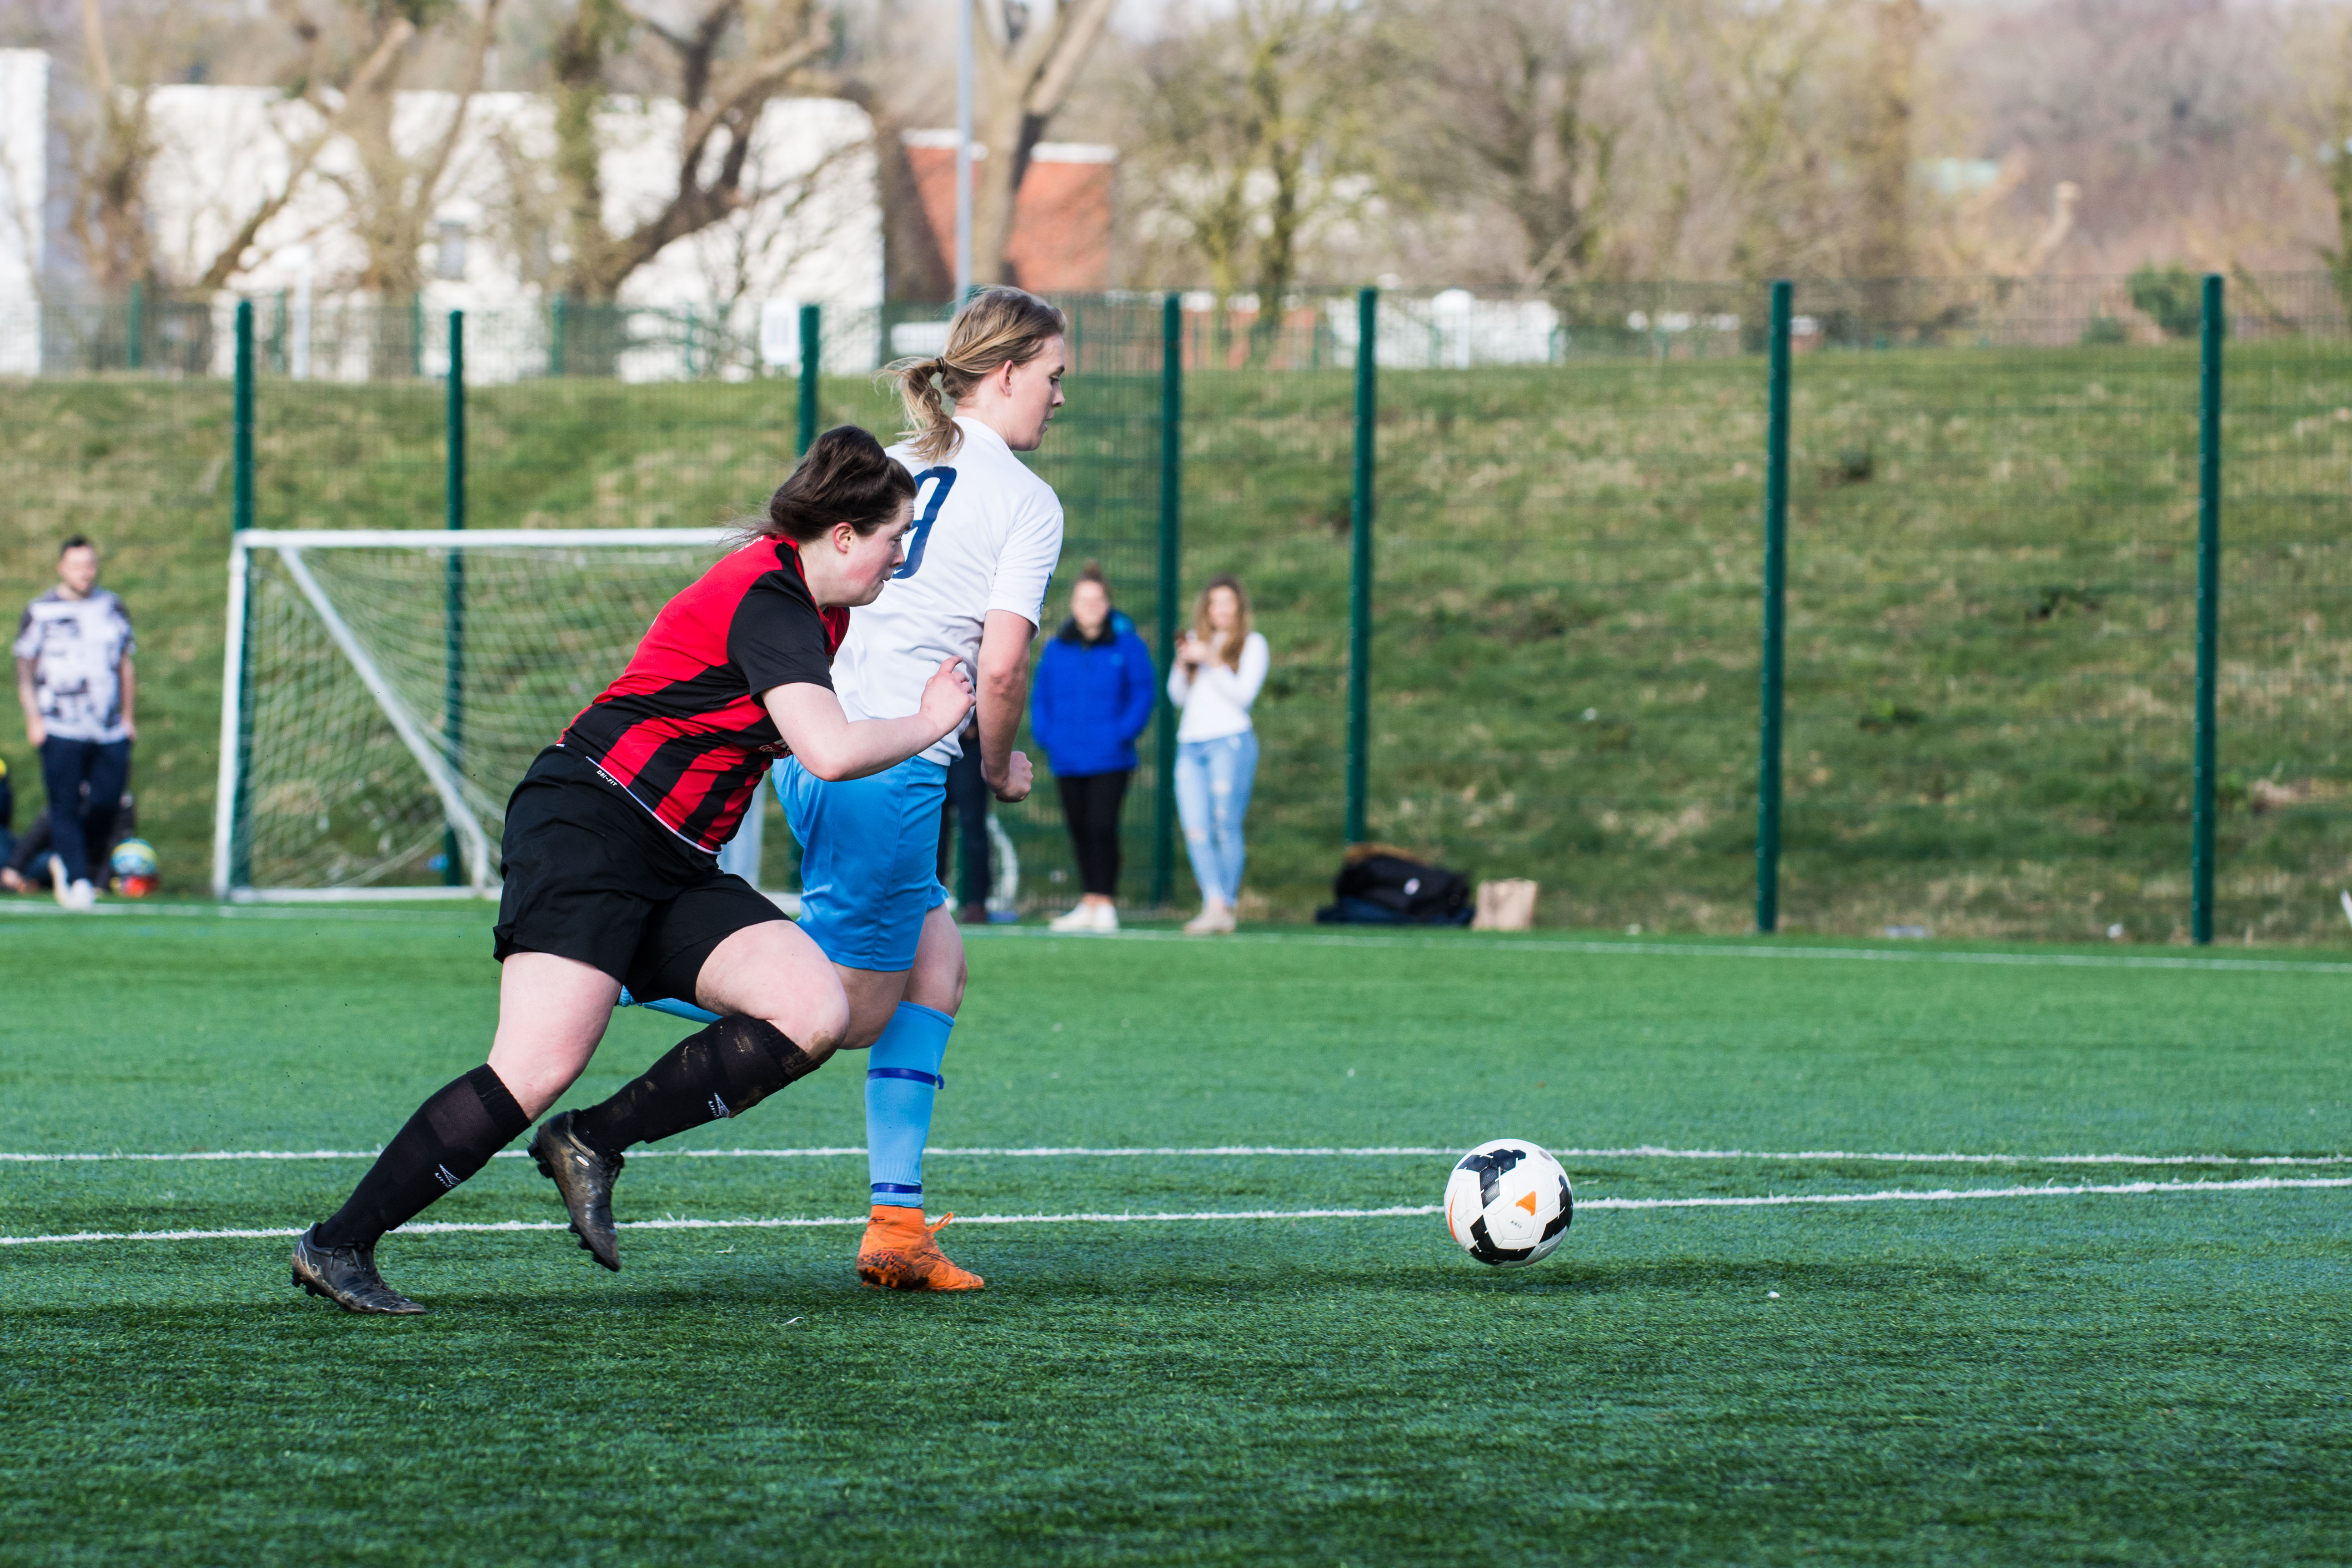 DAVID_JEFFERY Saltdean Utd Ladies FC vs Worthing Utd Ladies FC 11.03.18 12